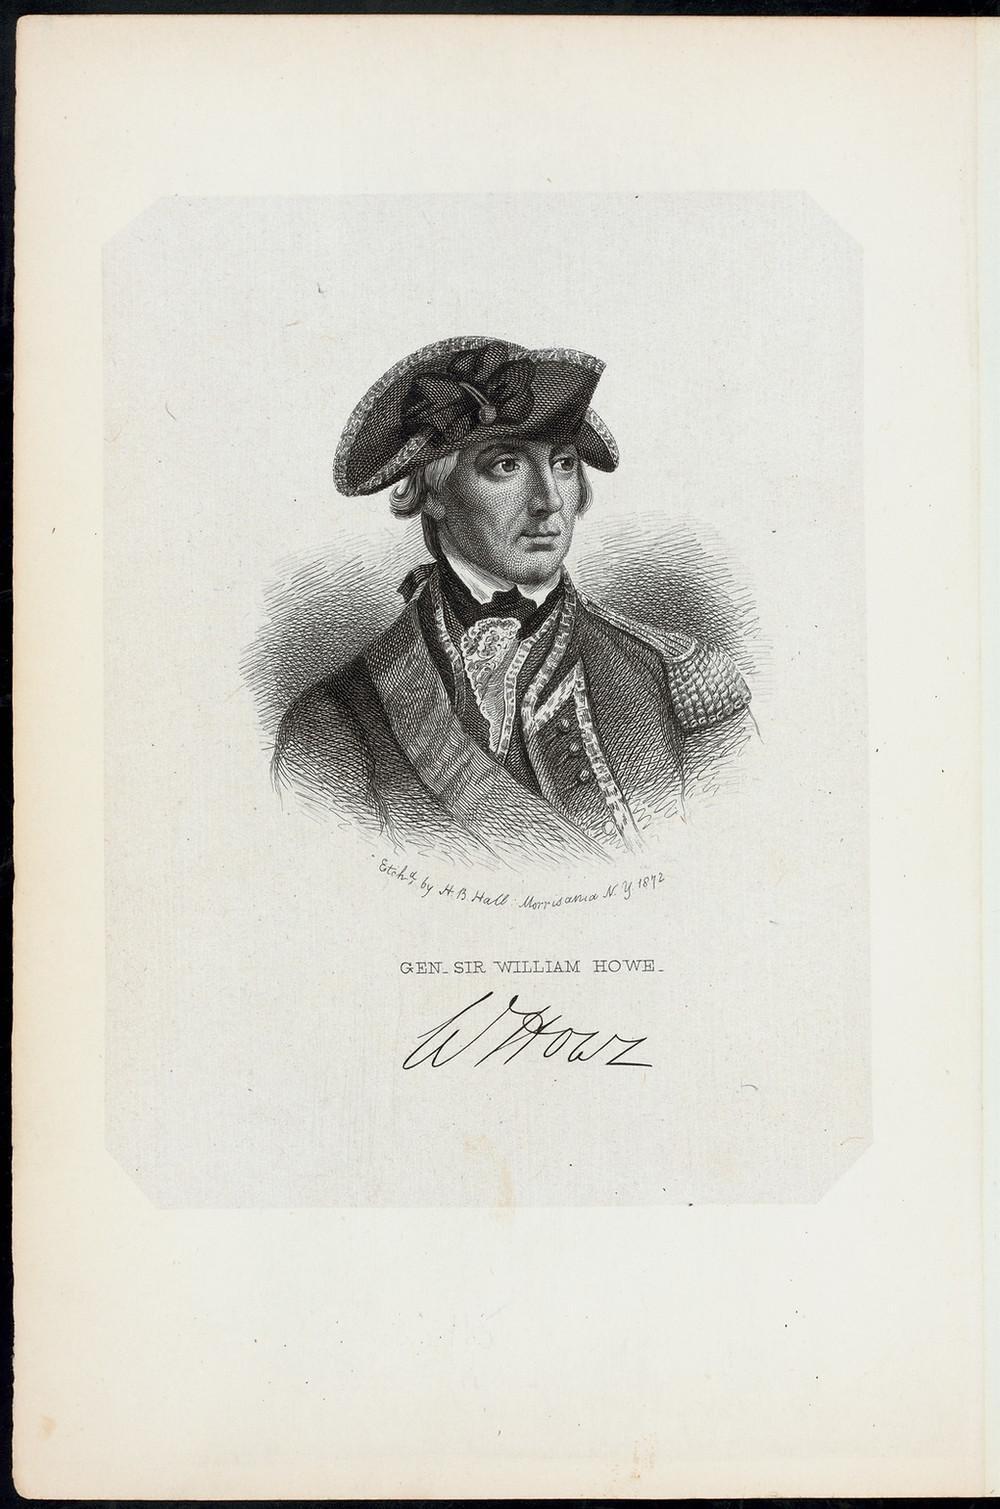 Gen. Sir William Howe. - New York Public Library